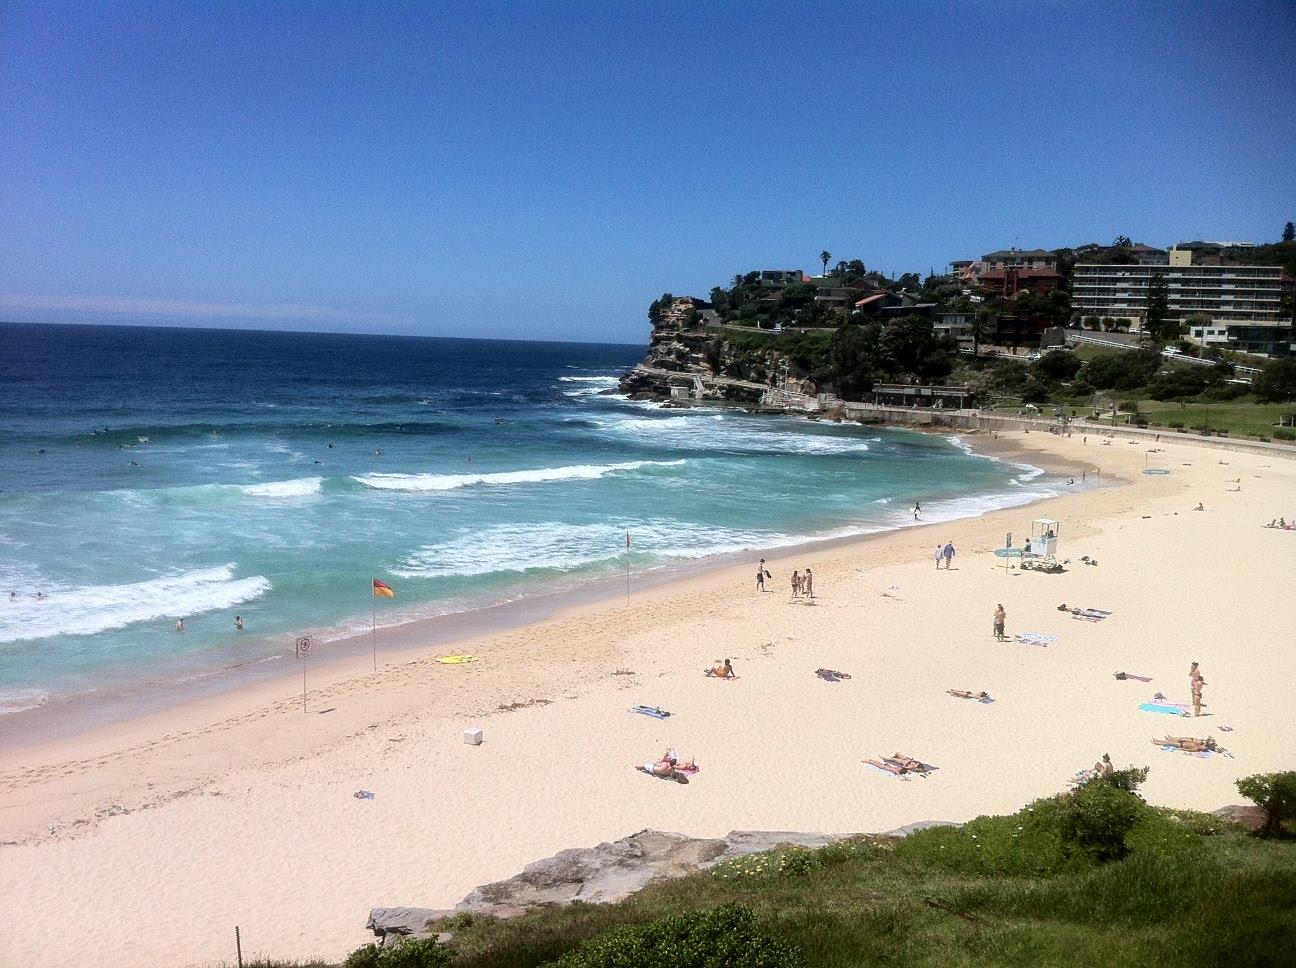 Bondi Beach NSW, Australia